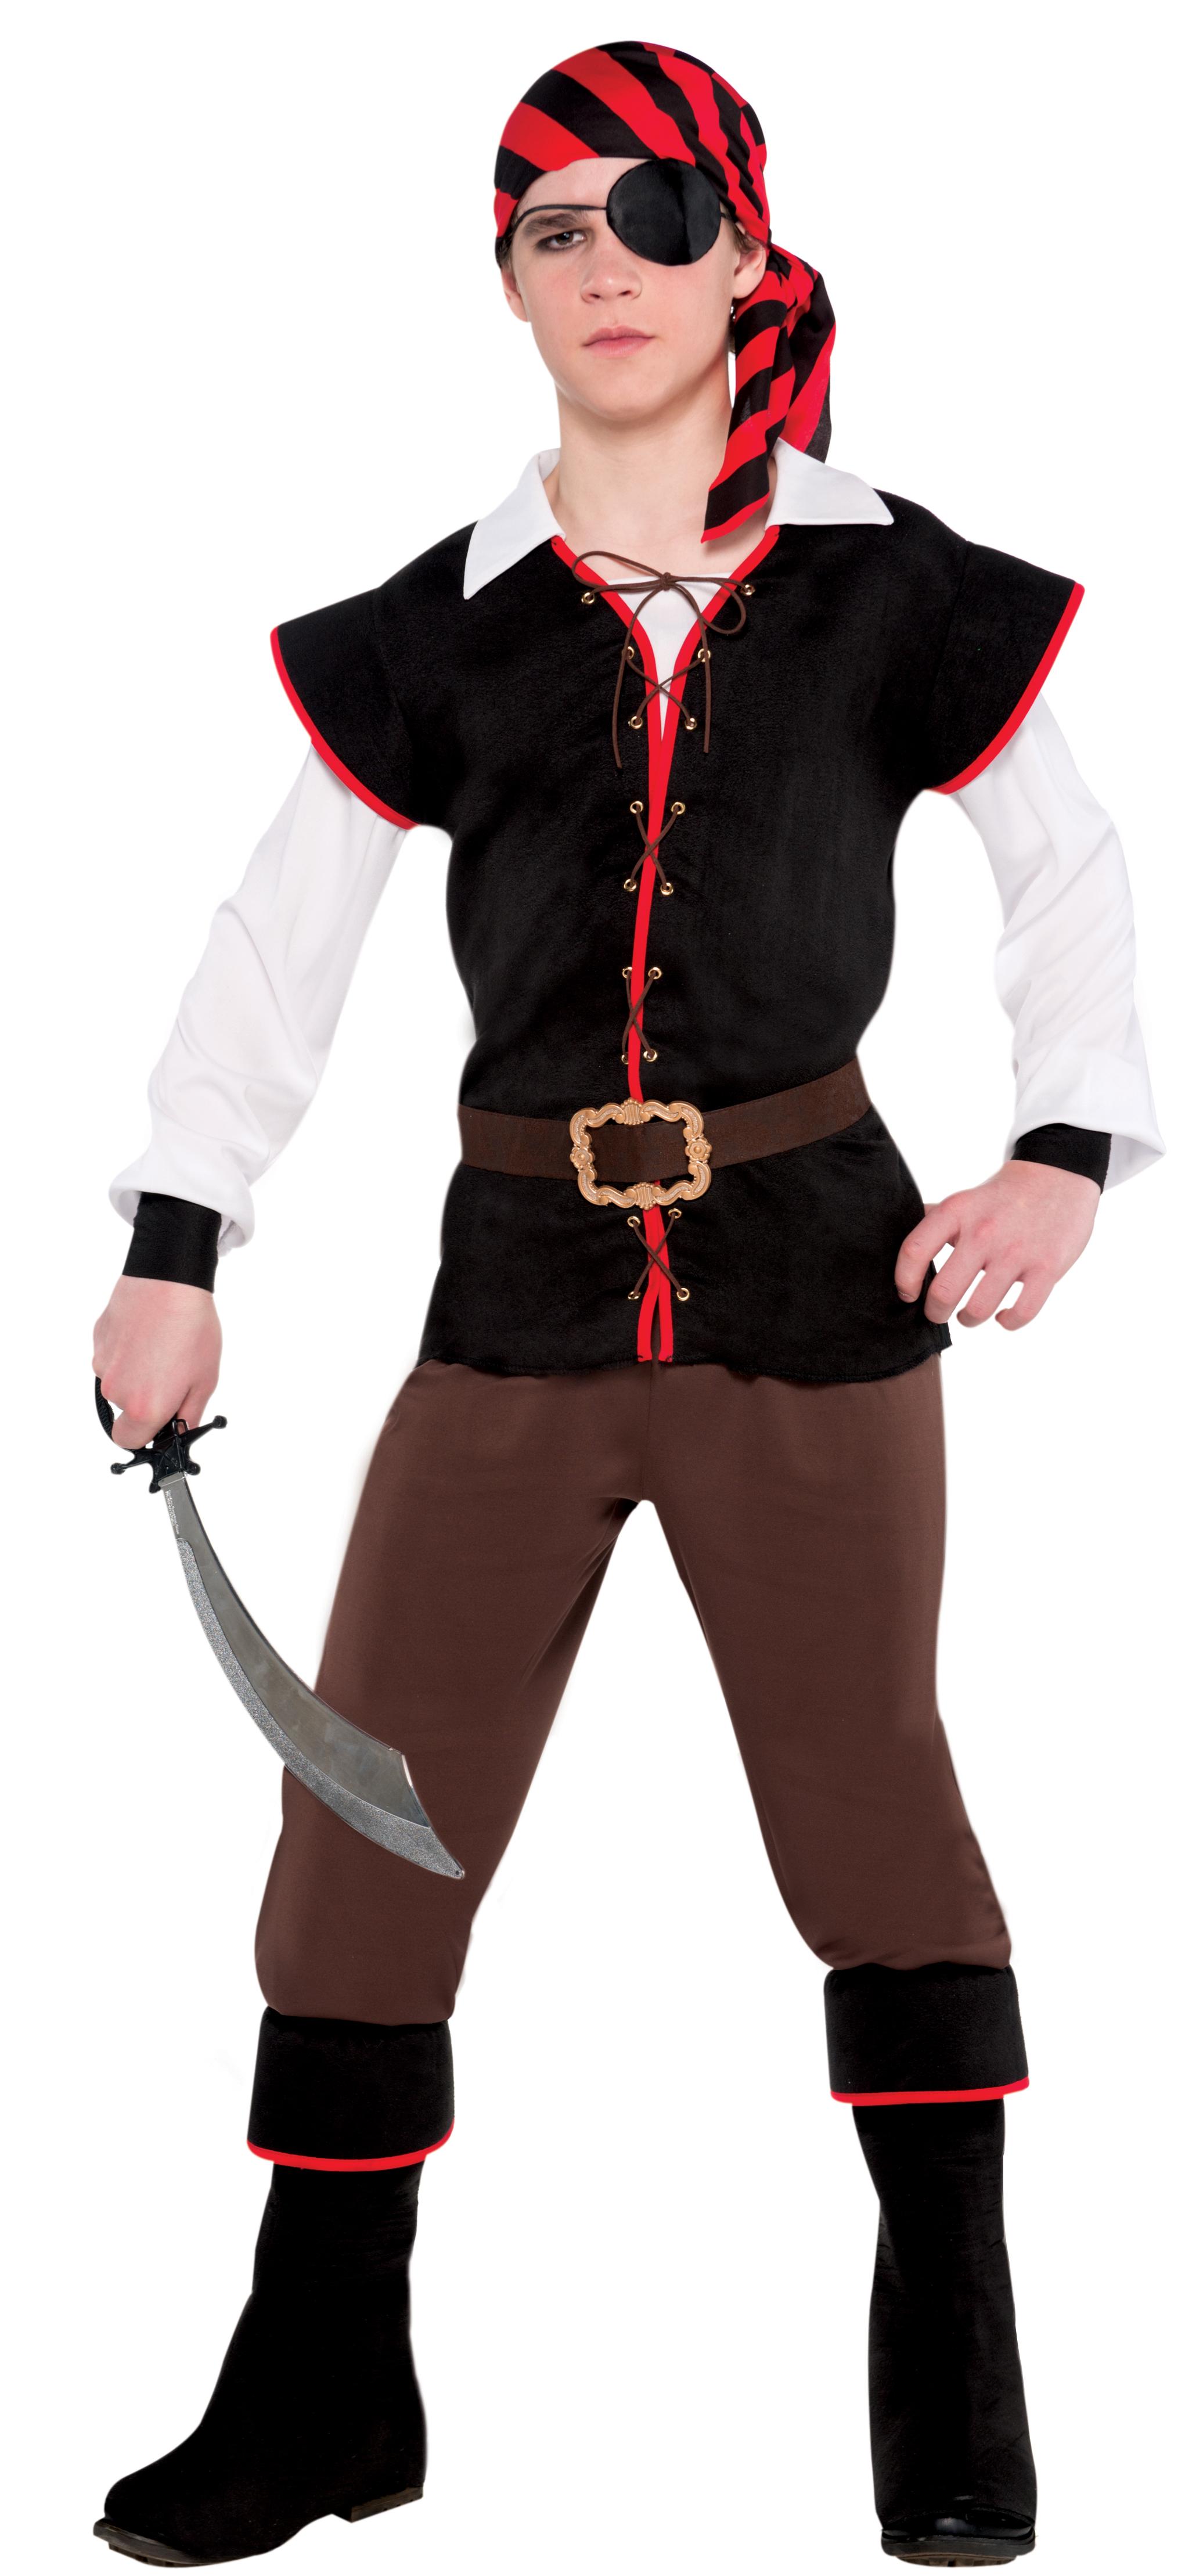 ab6362cd38b4 Boys Rebel of the Sea Costume